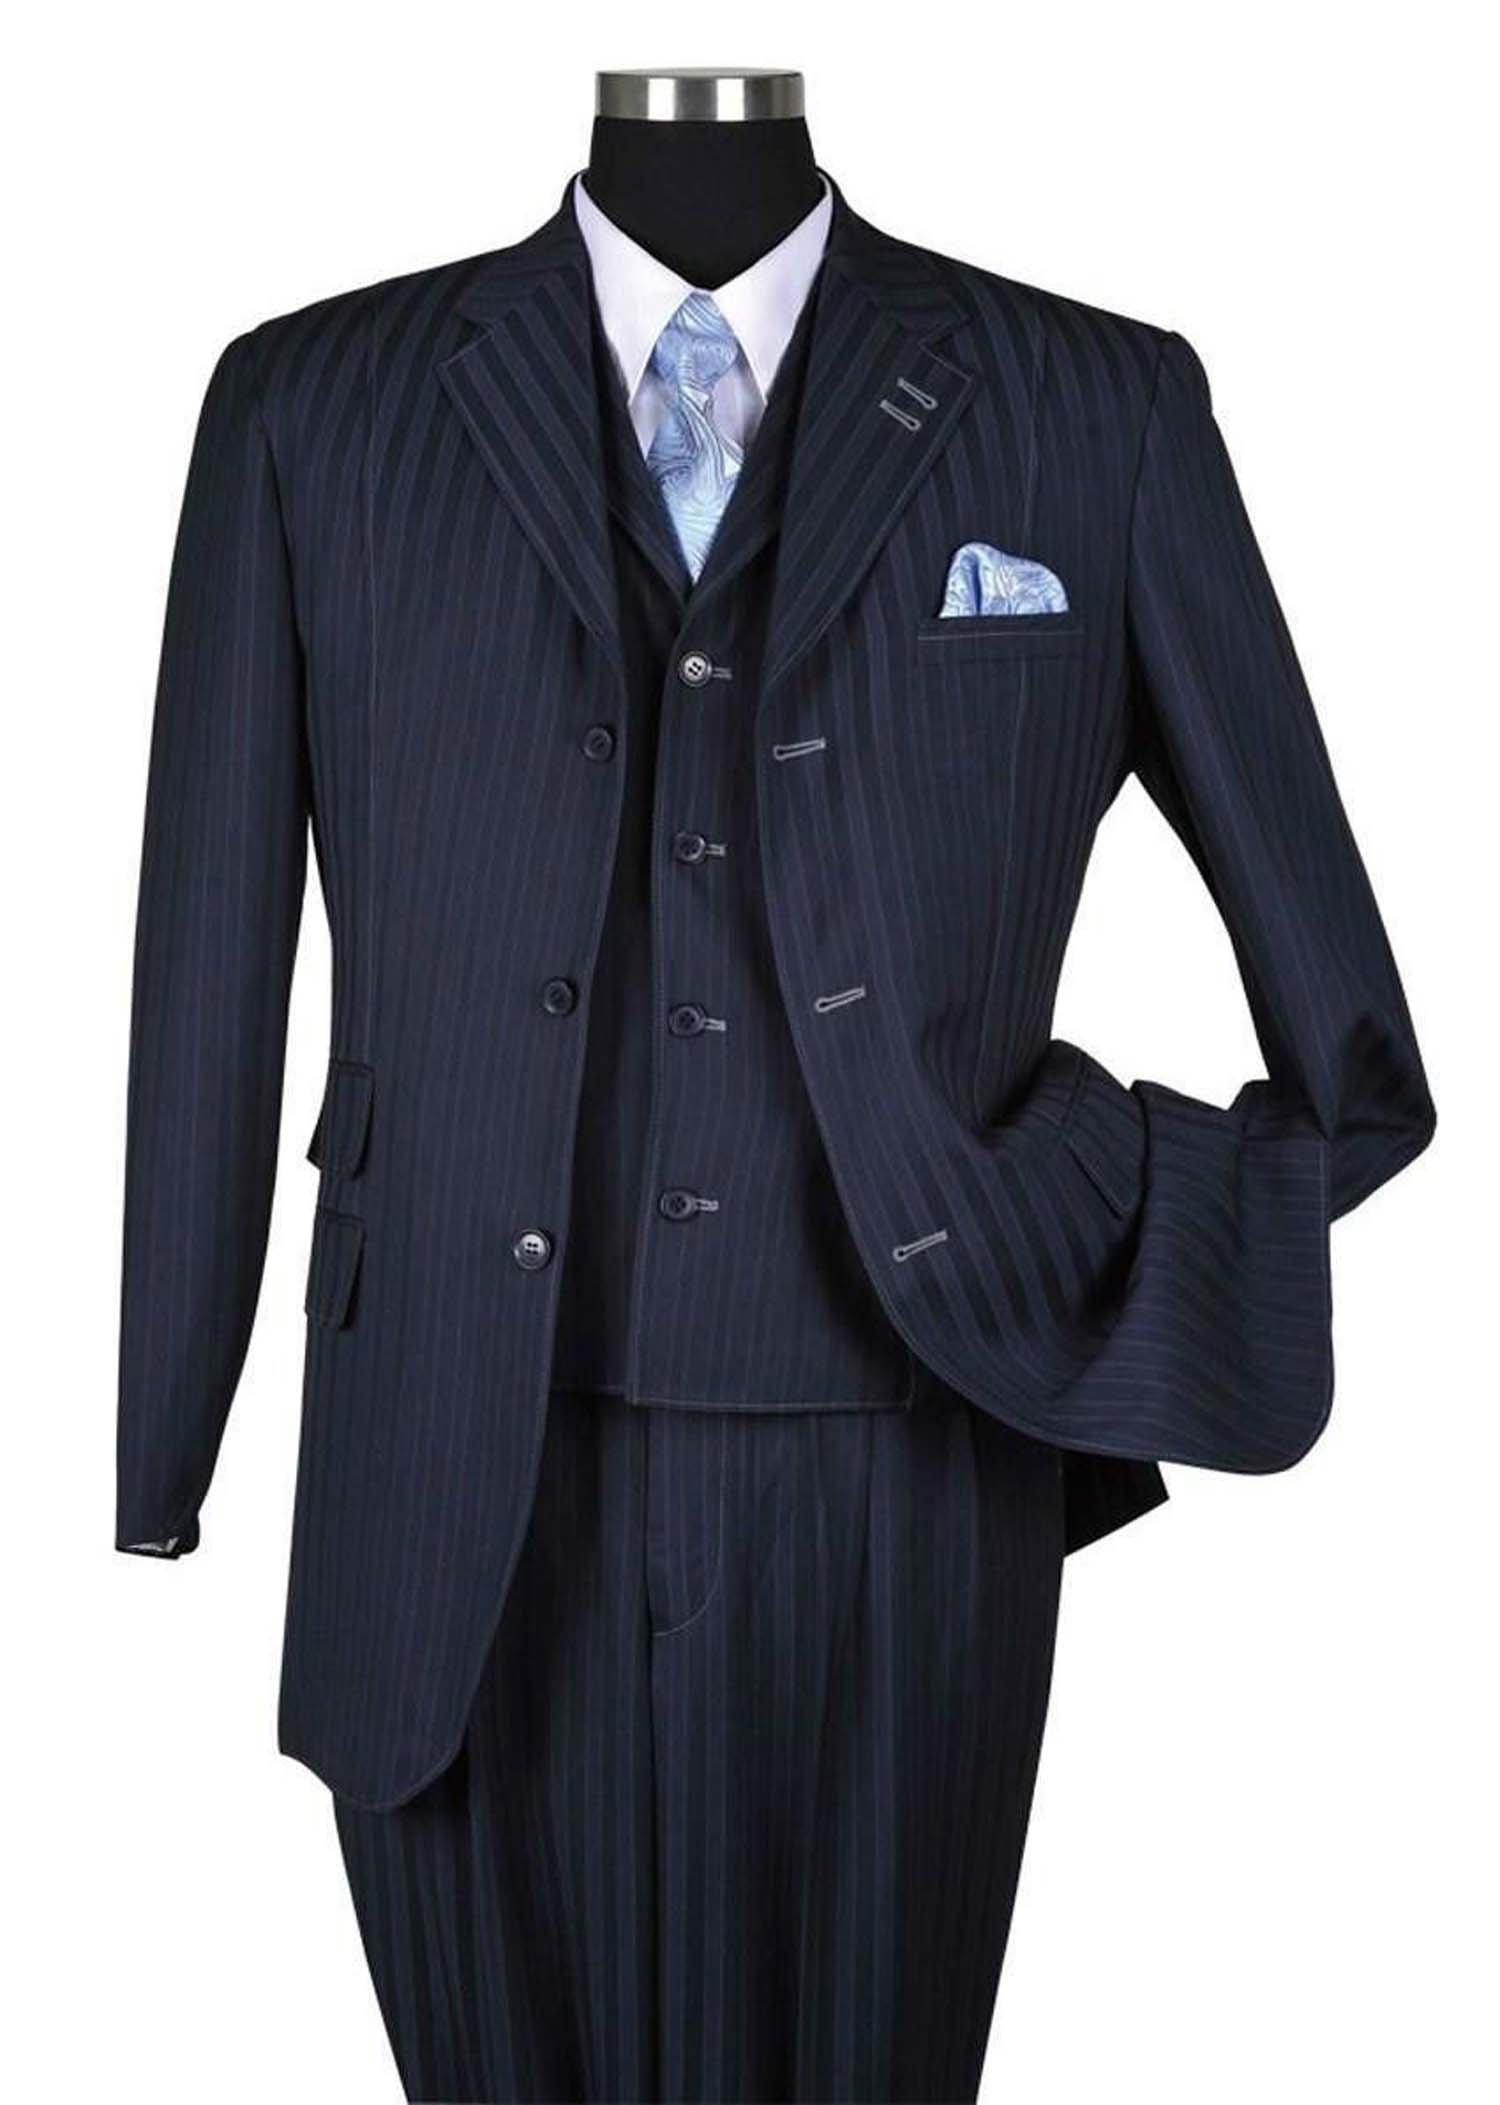 Milano Moda Fancy Stripe High Fashion Suit with Vest & Pants 5267-Navy-44R